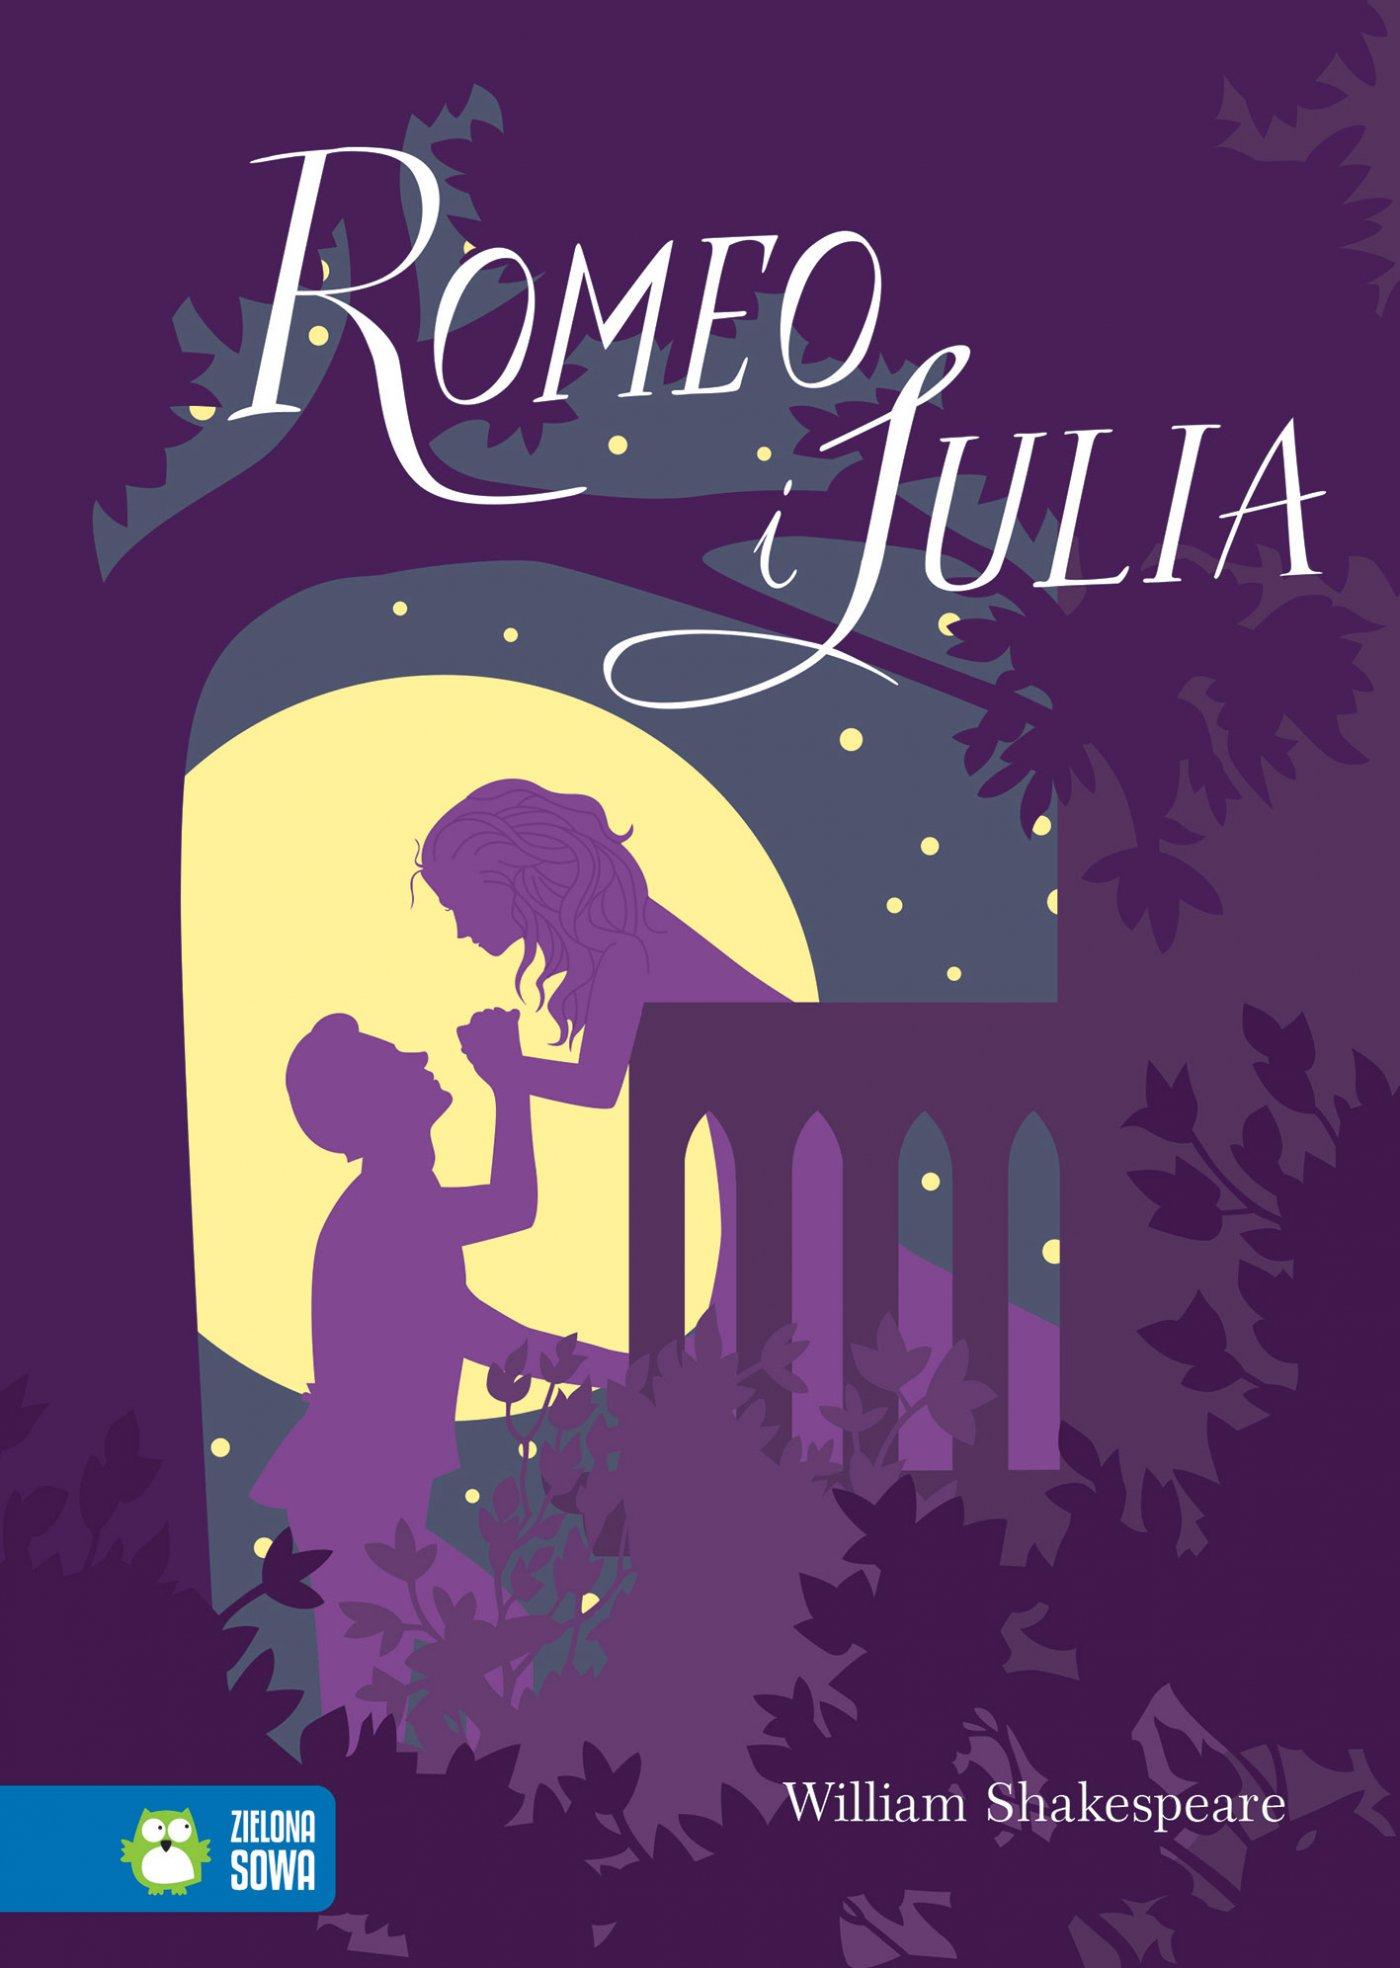 Romeo i Julia. Literatura klasyczna - Ebook (Książka na Kindle) do pobrania w formacie MOBI